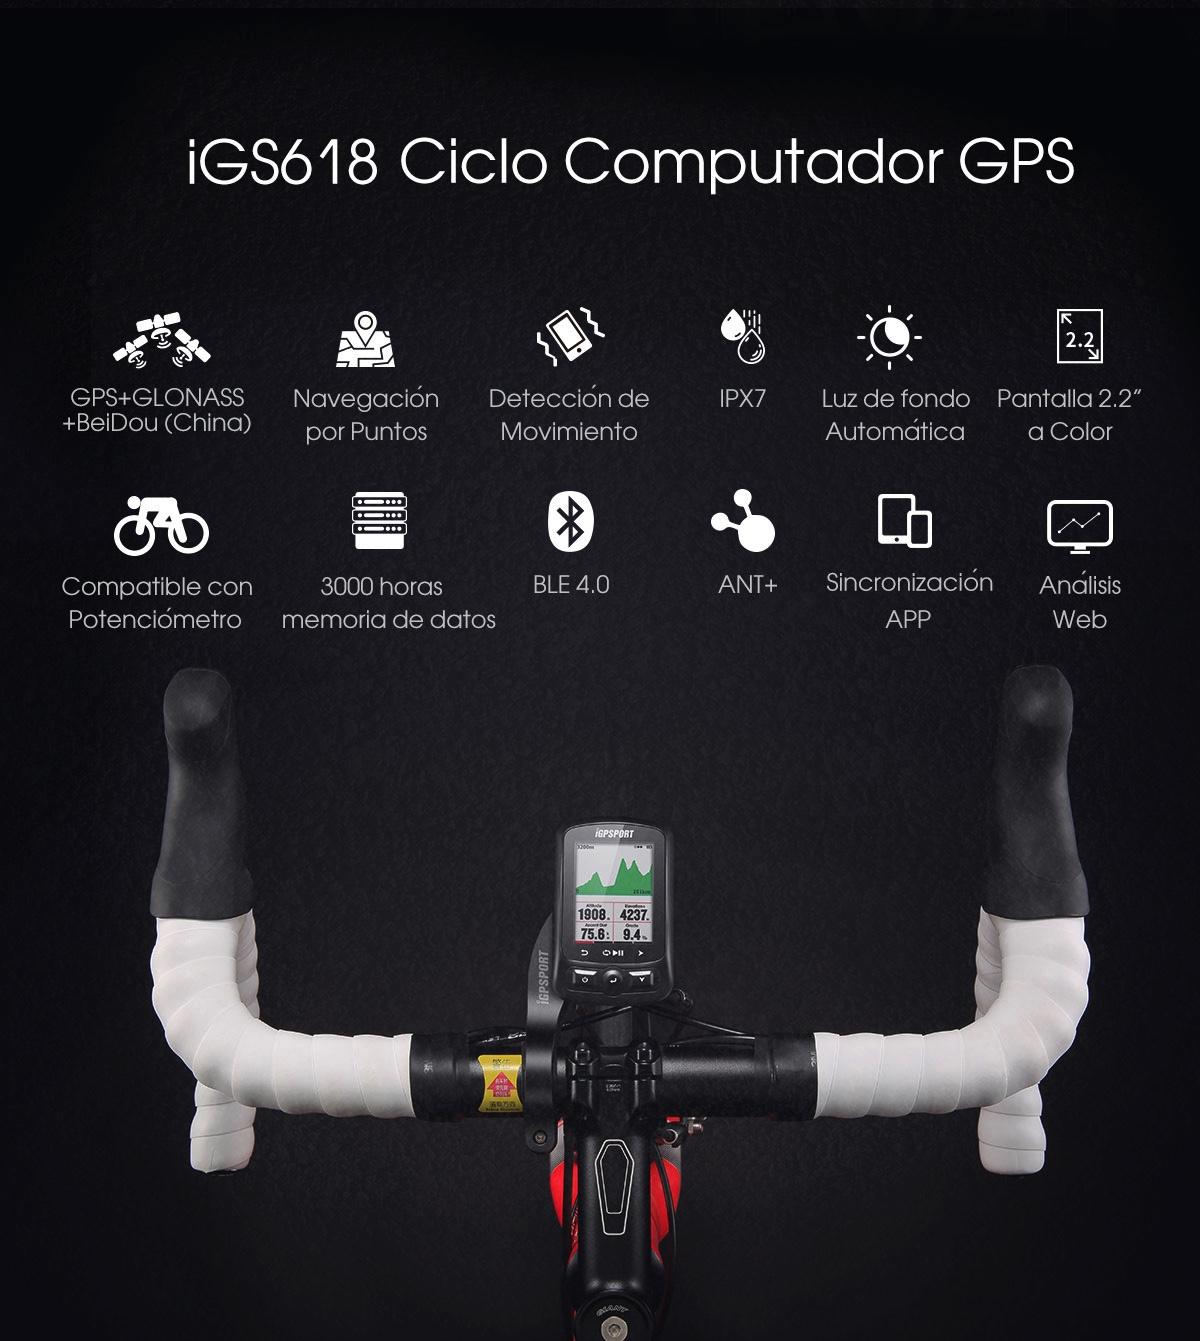 igs618-espa_02 1